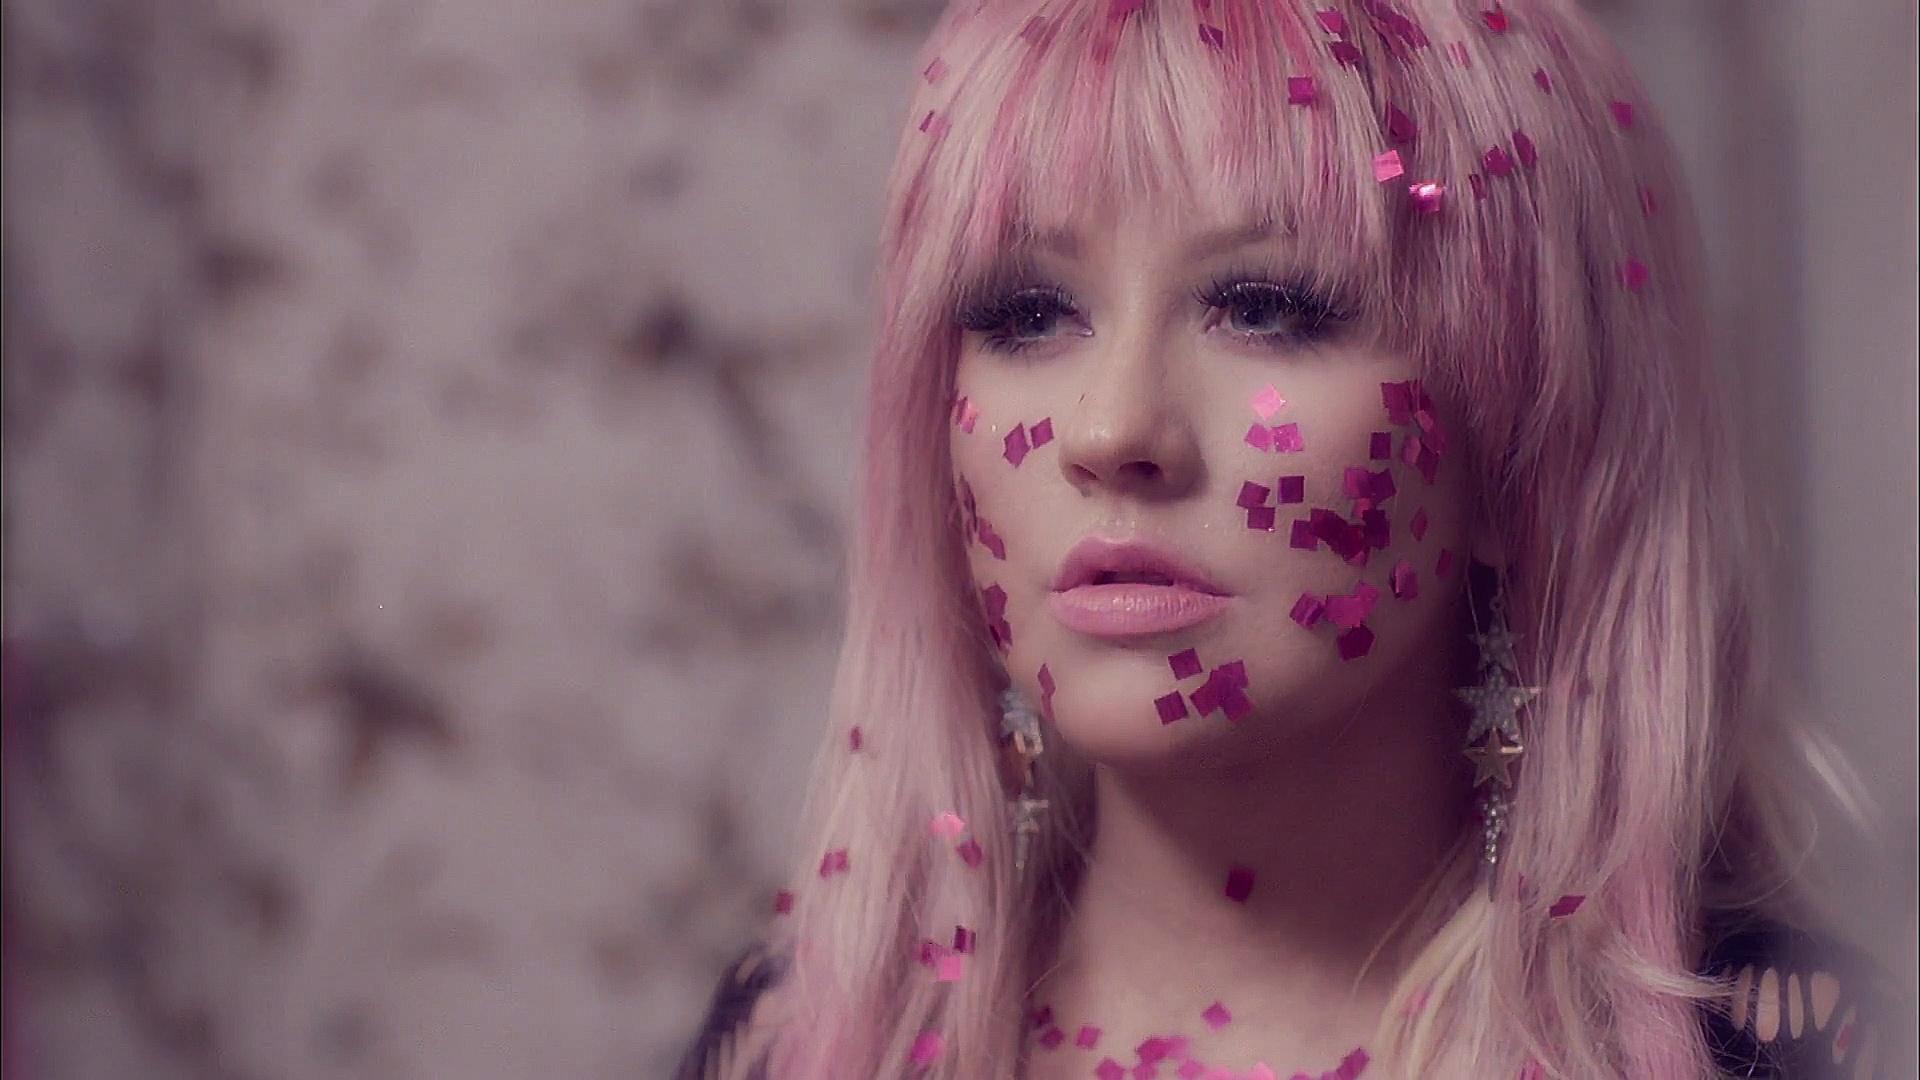 Christina Aguilera Wallpaper 2013